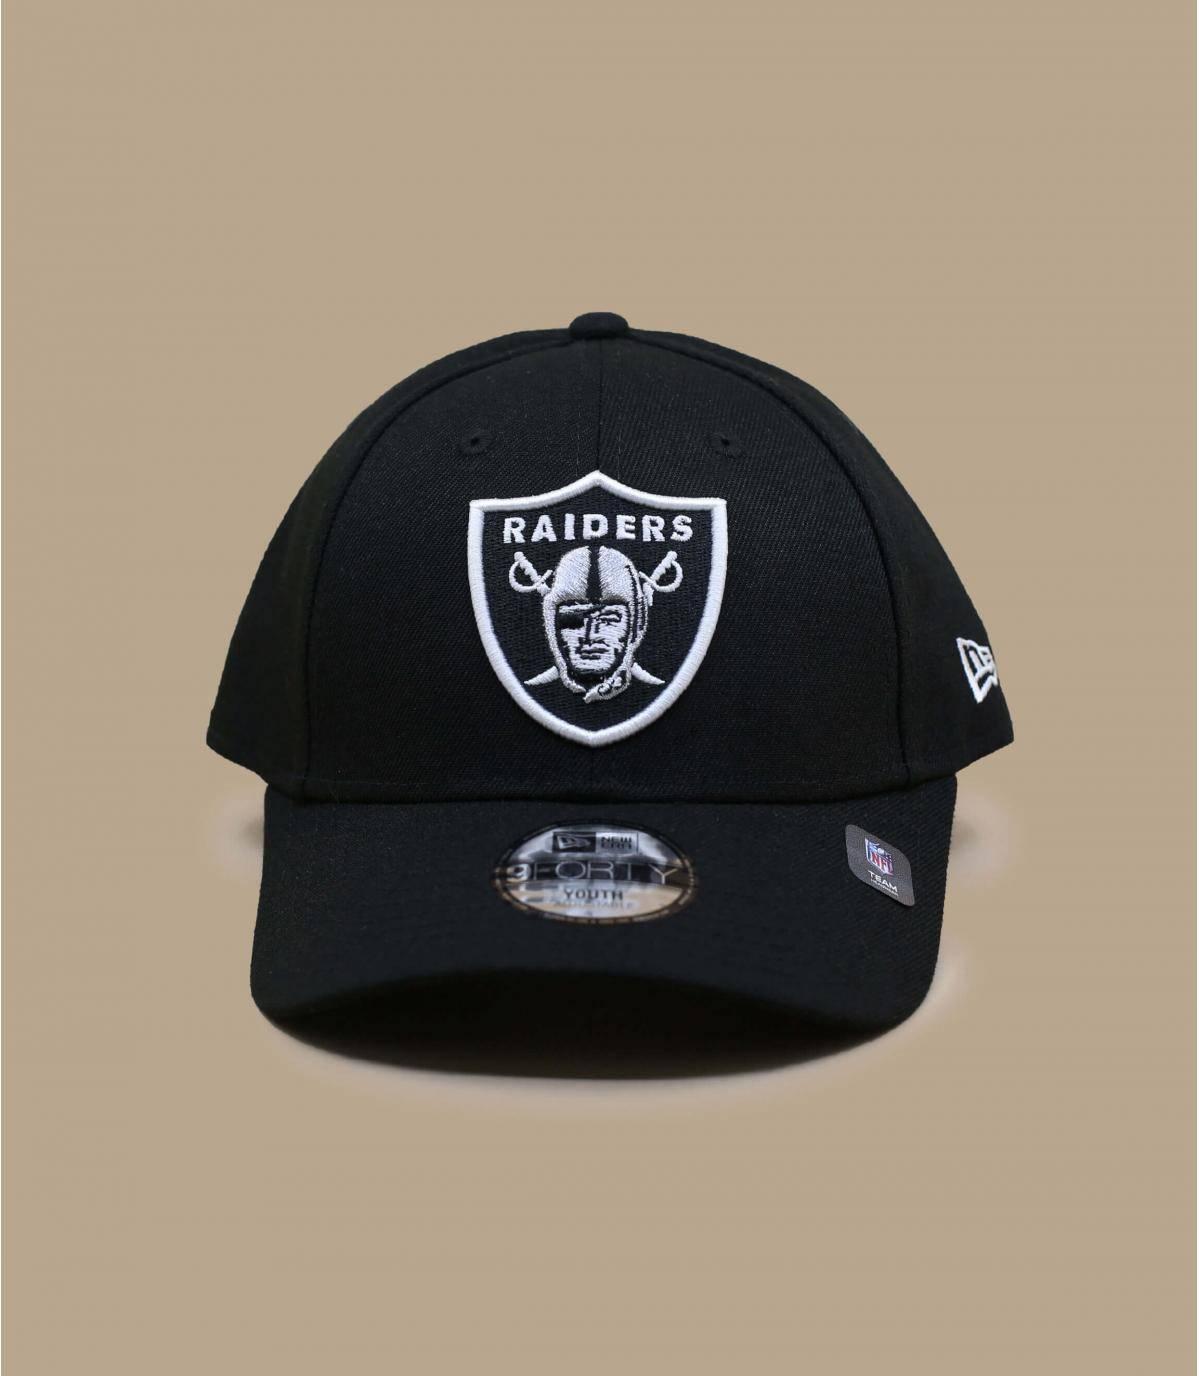 Details Kids NFL The League Raiders - afbeeling 2